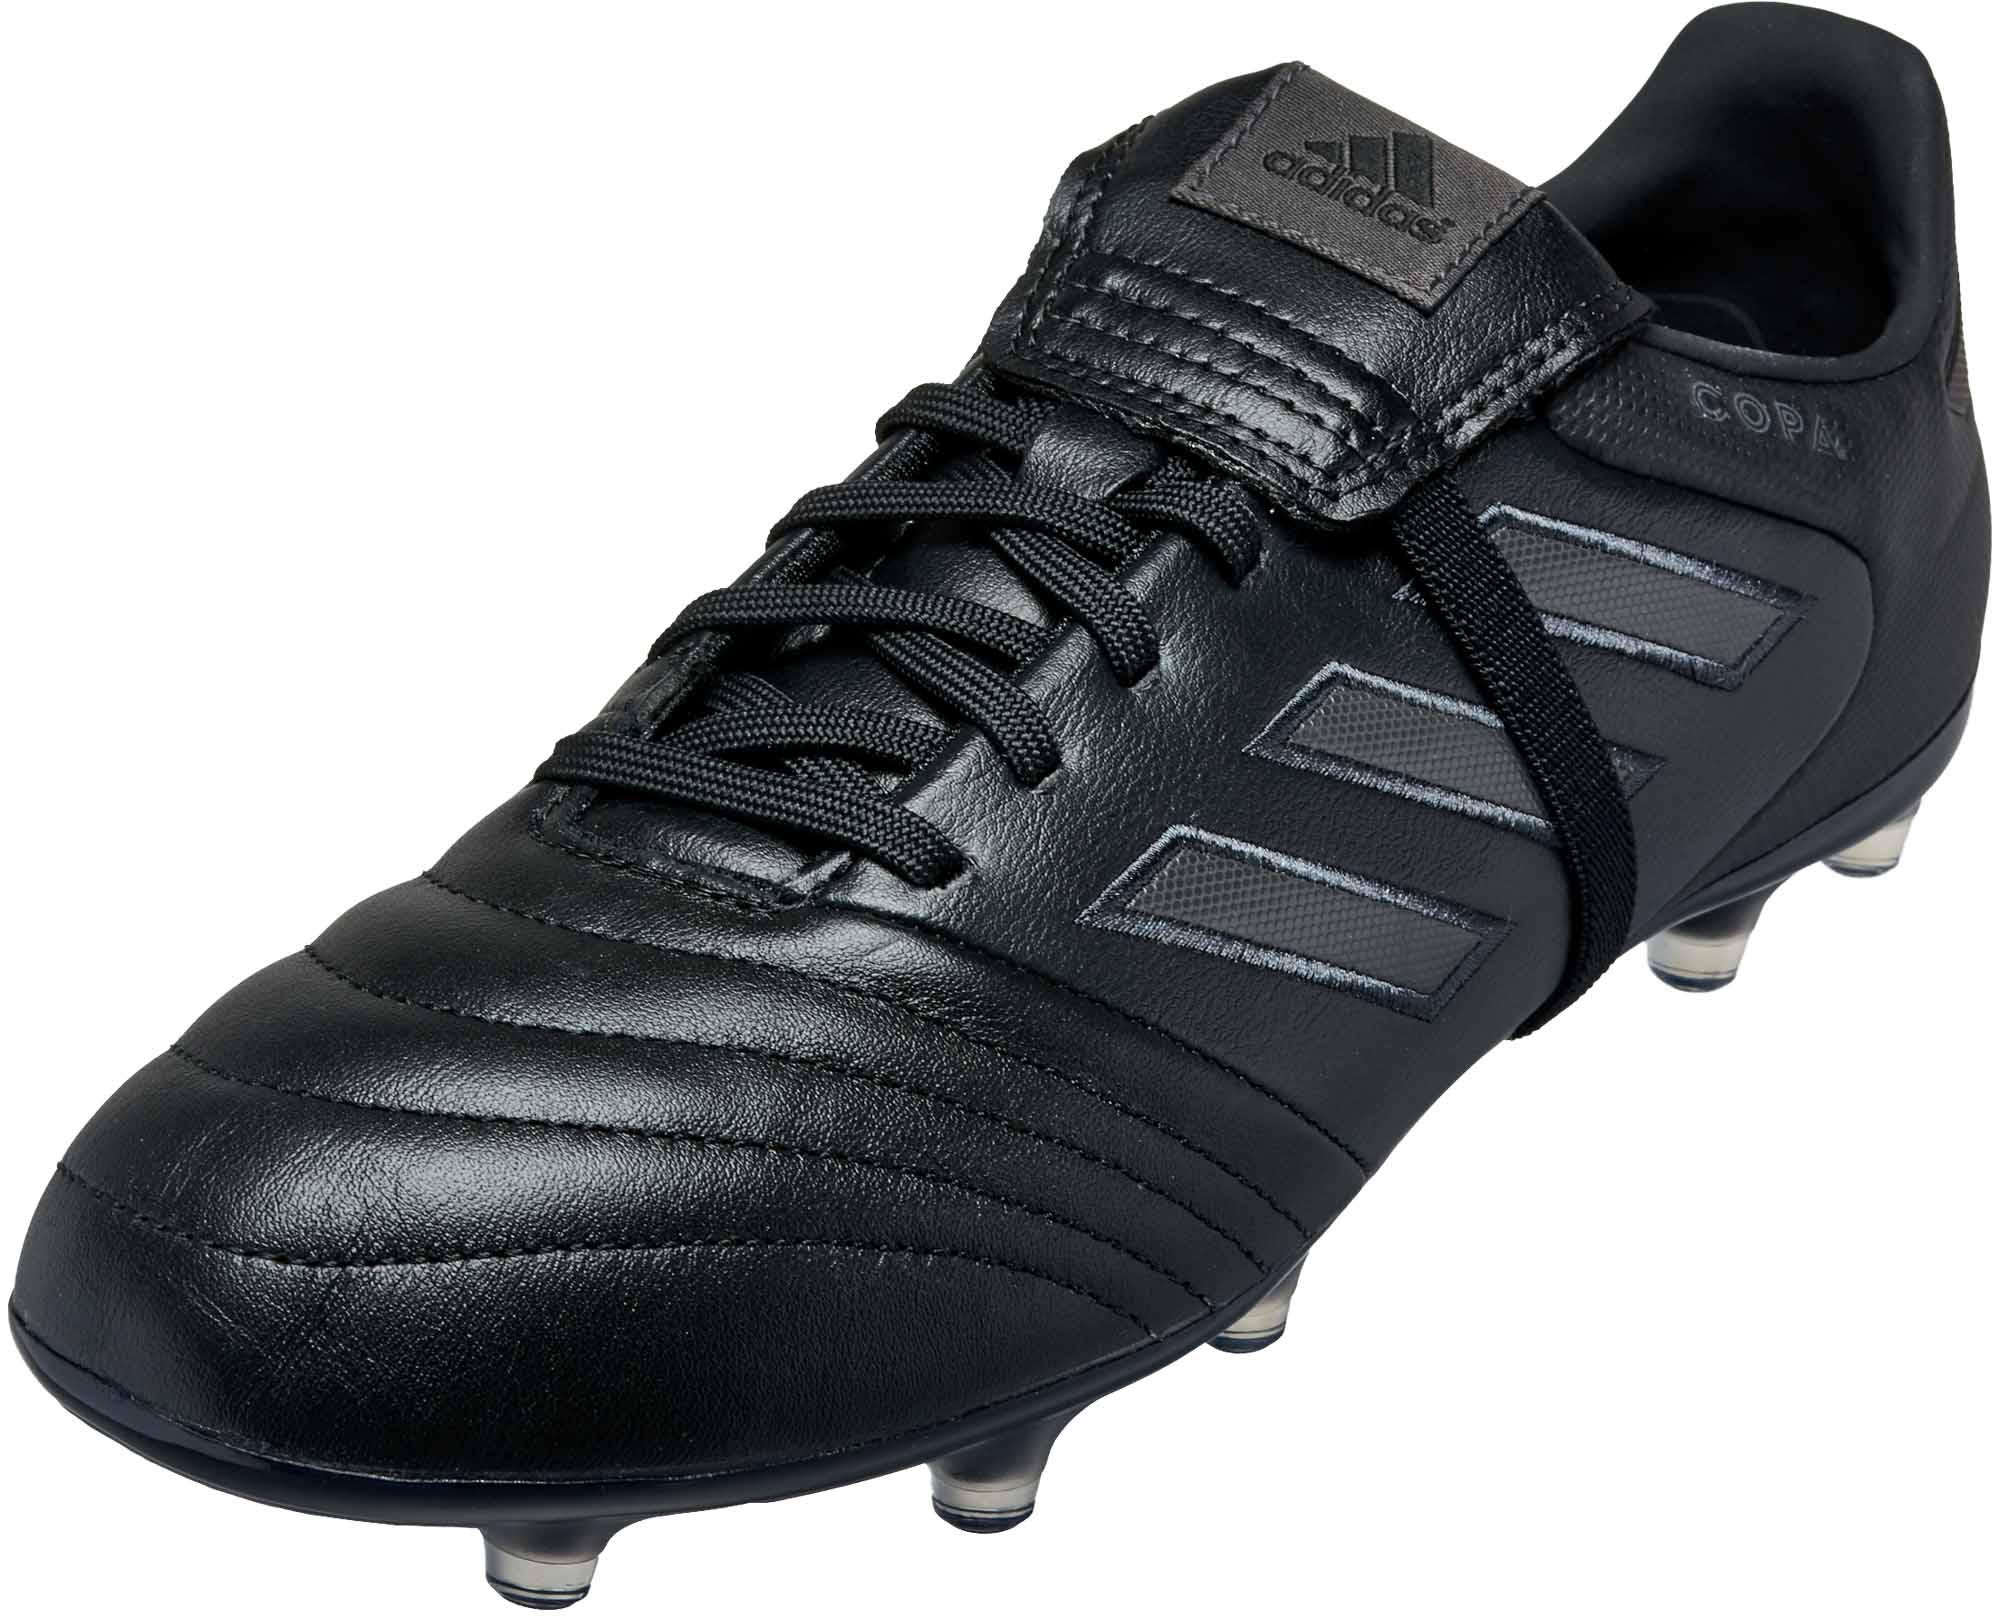 54c89e52b adidas Copa Gloro 17.2 FG - Core Black   Utility Black - Soccer Master